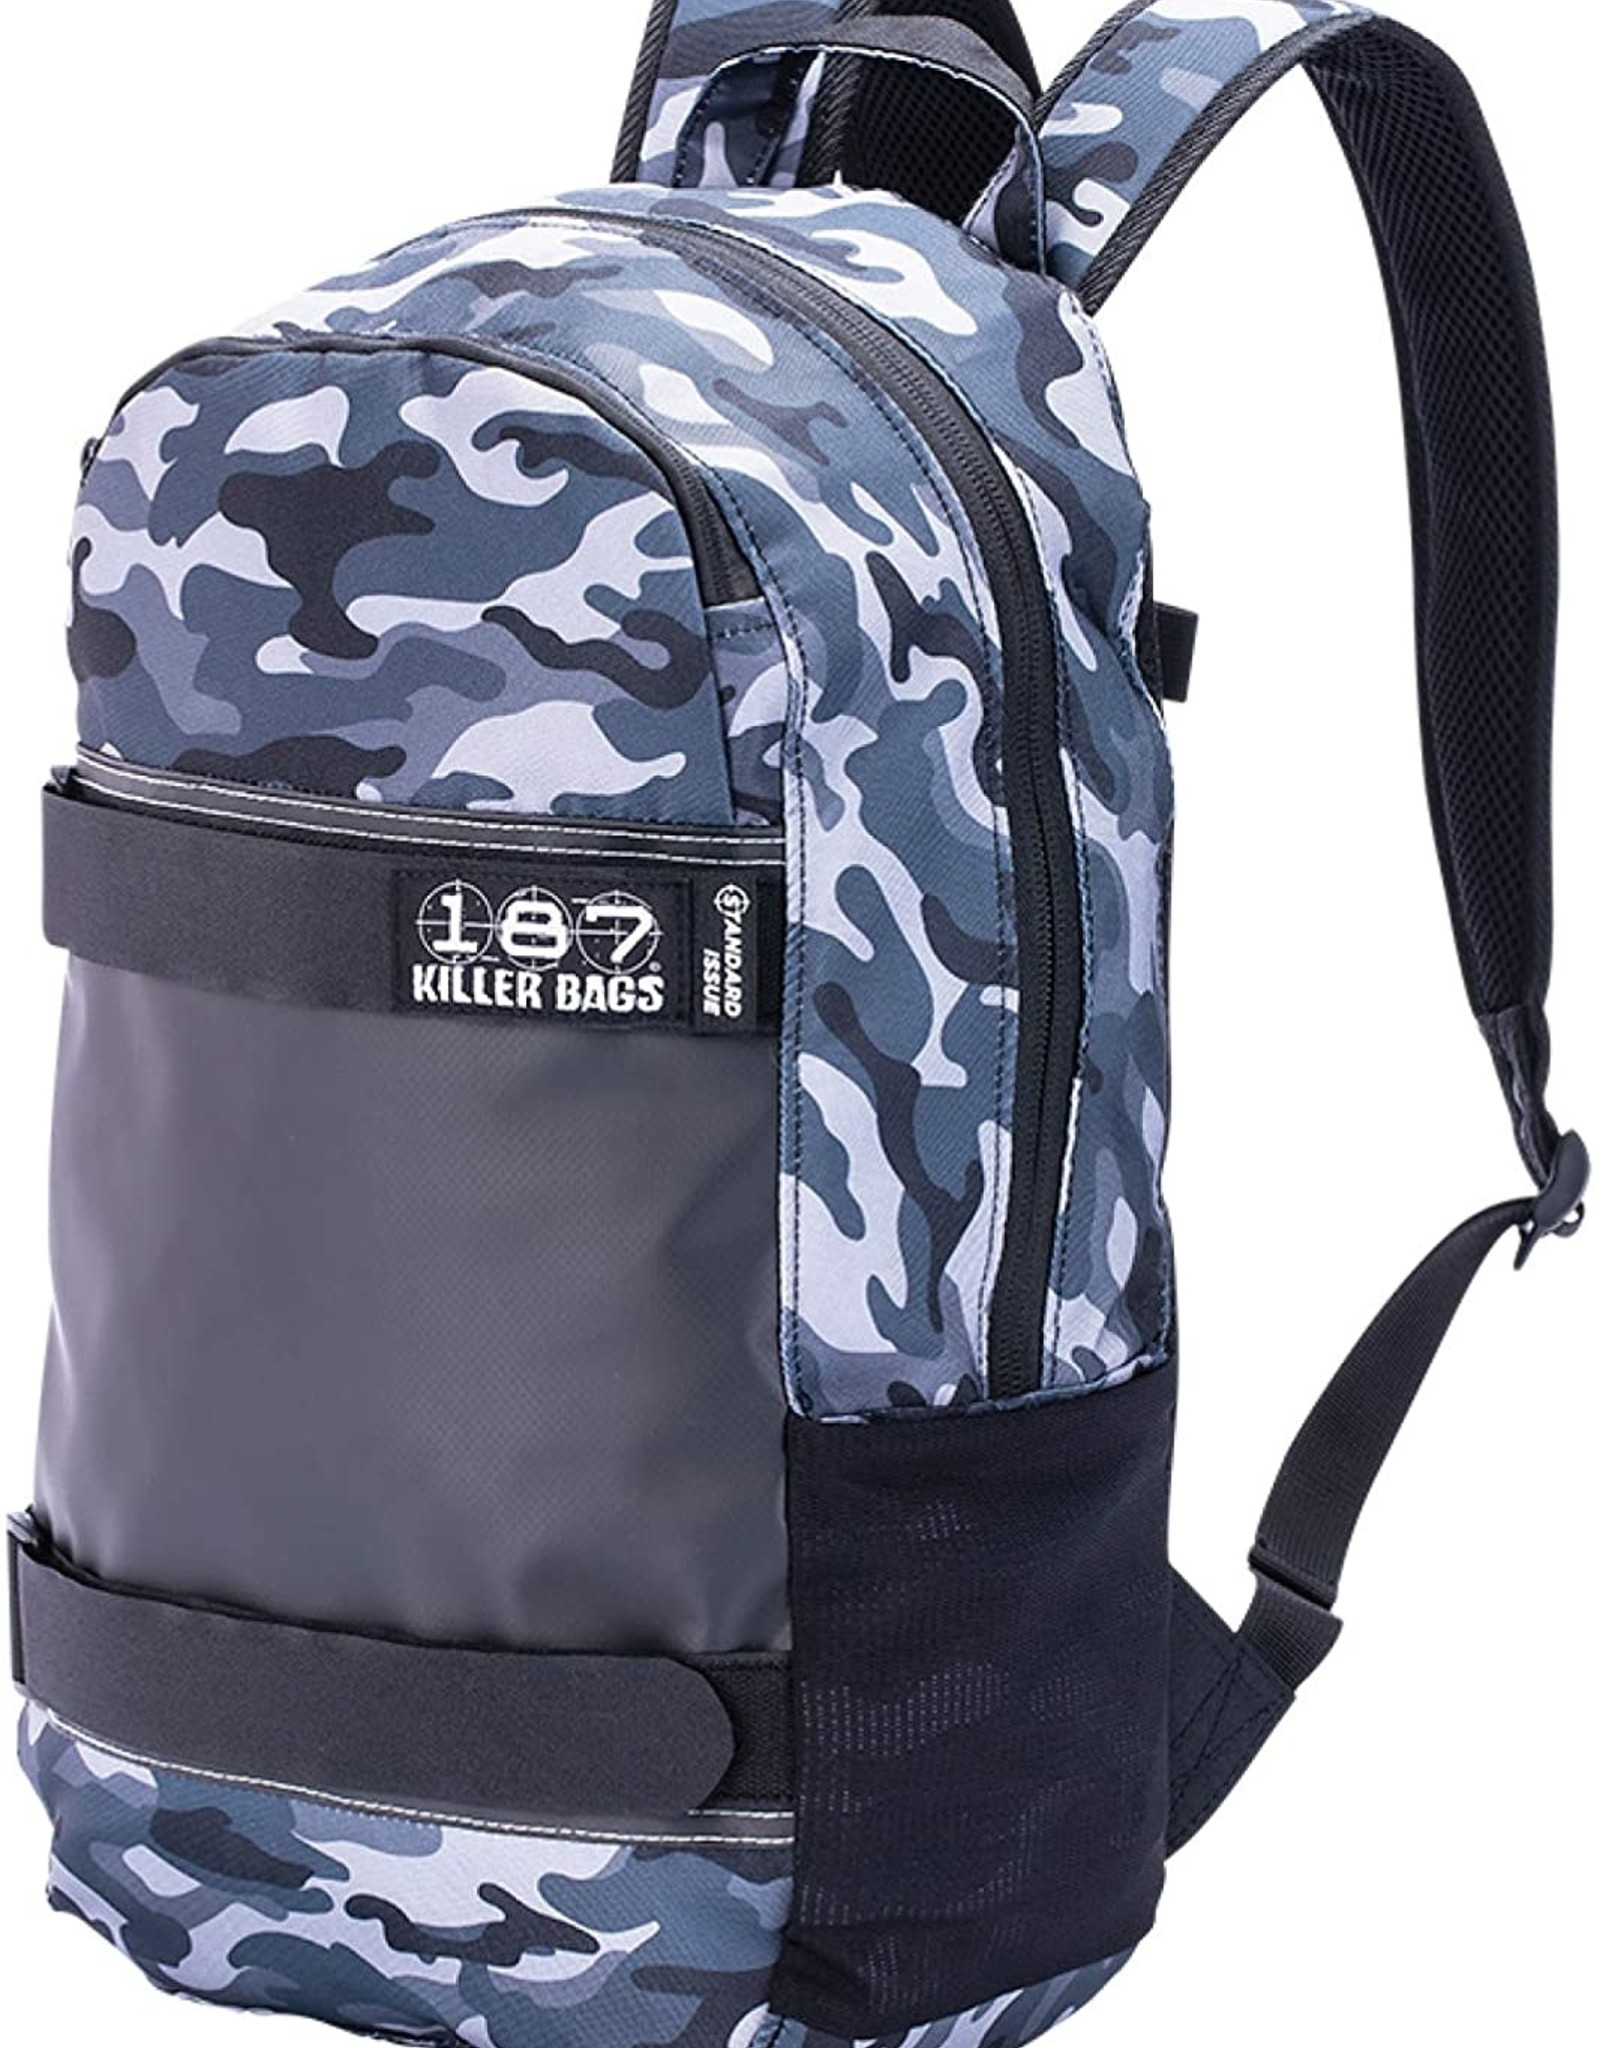 187 Bag Standard Backpack charcoal camo